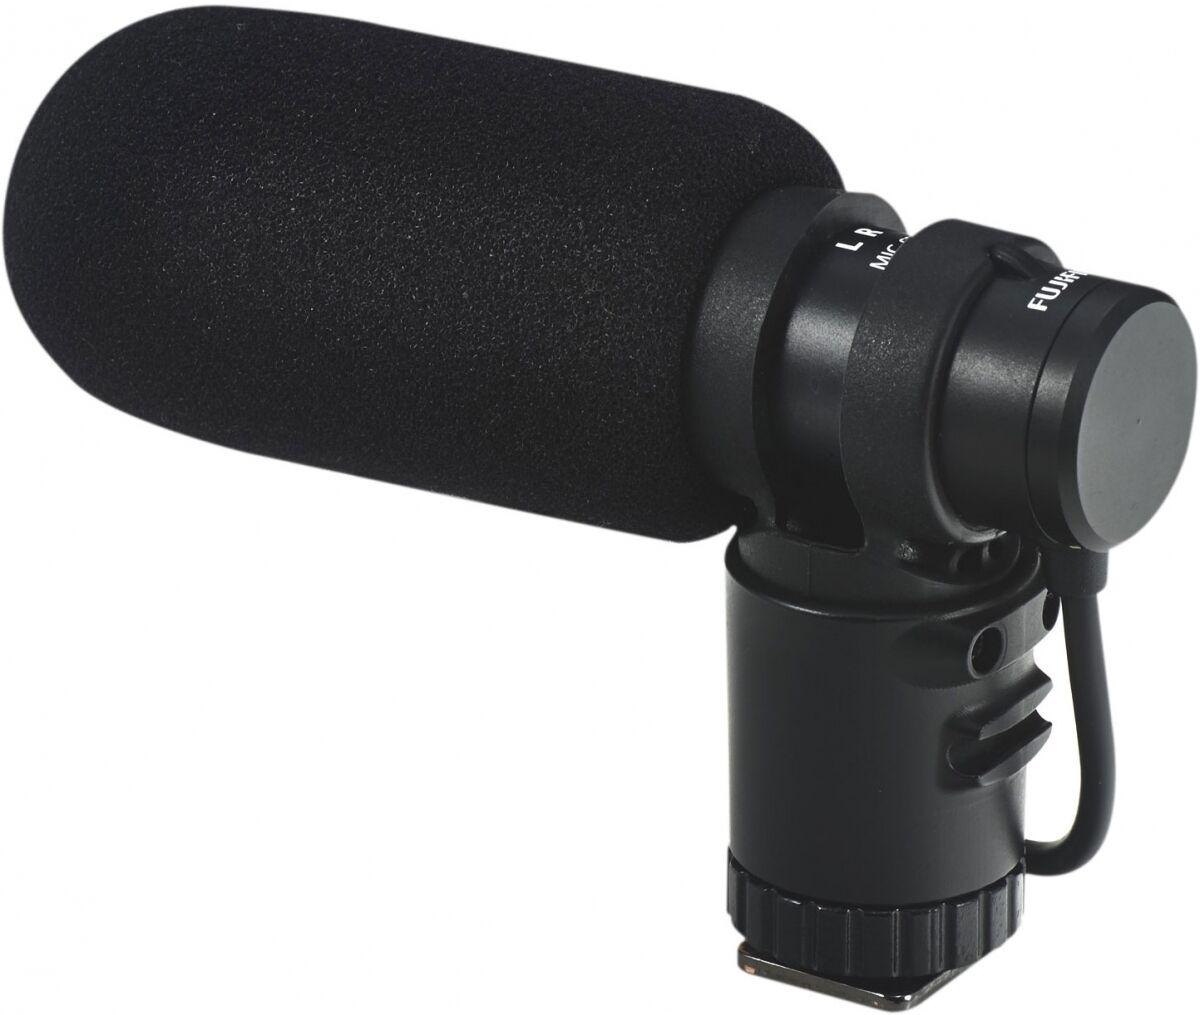 Fujifilm Microphone MIC-ST1 Stéréo (XE1/XE2/XS1/X100S/X20/HS50)